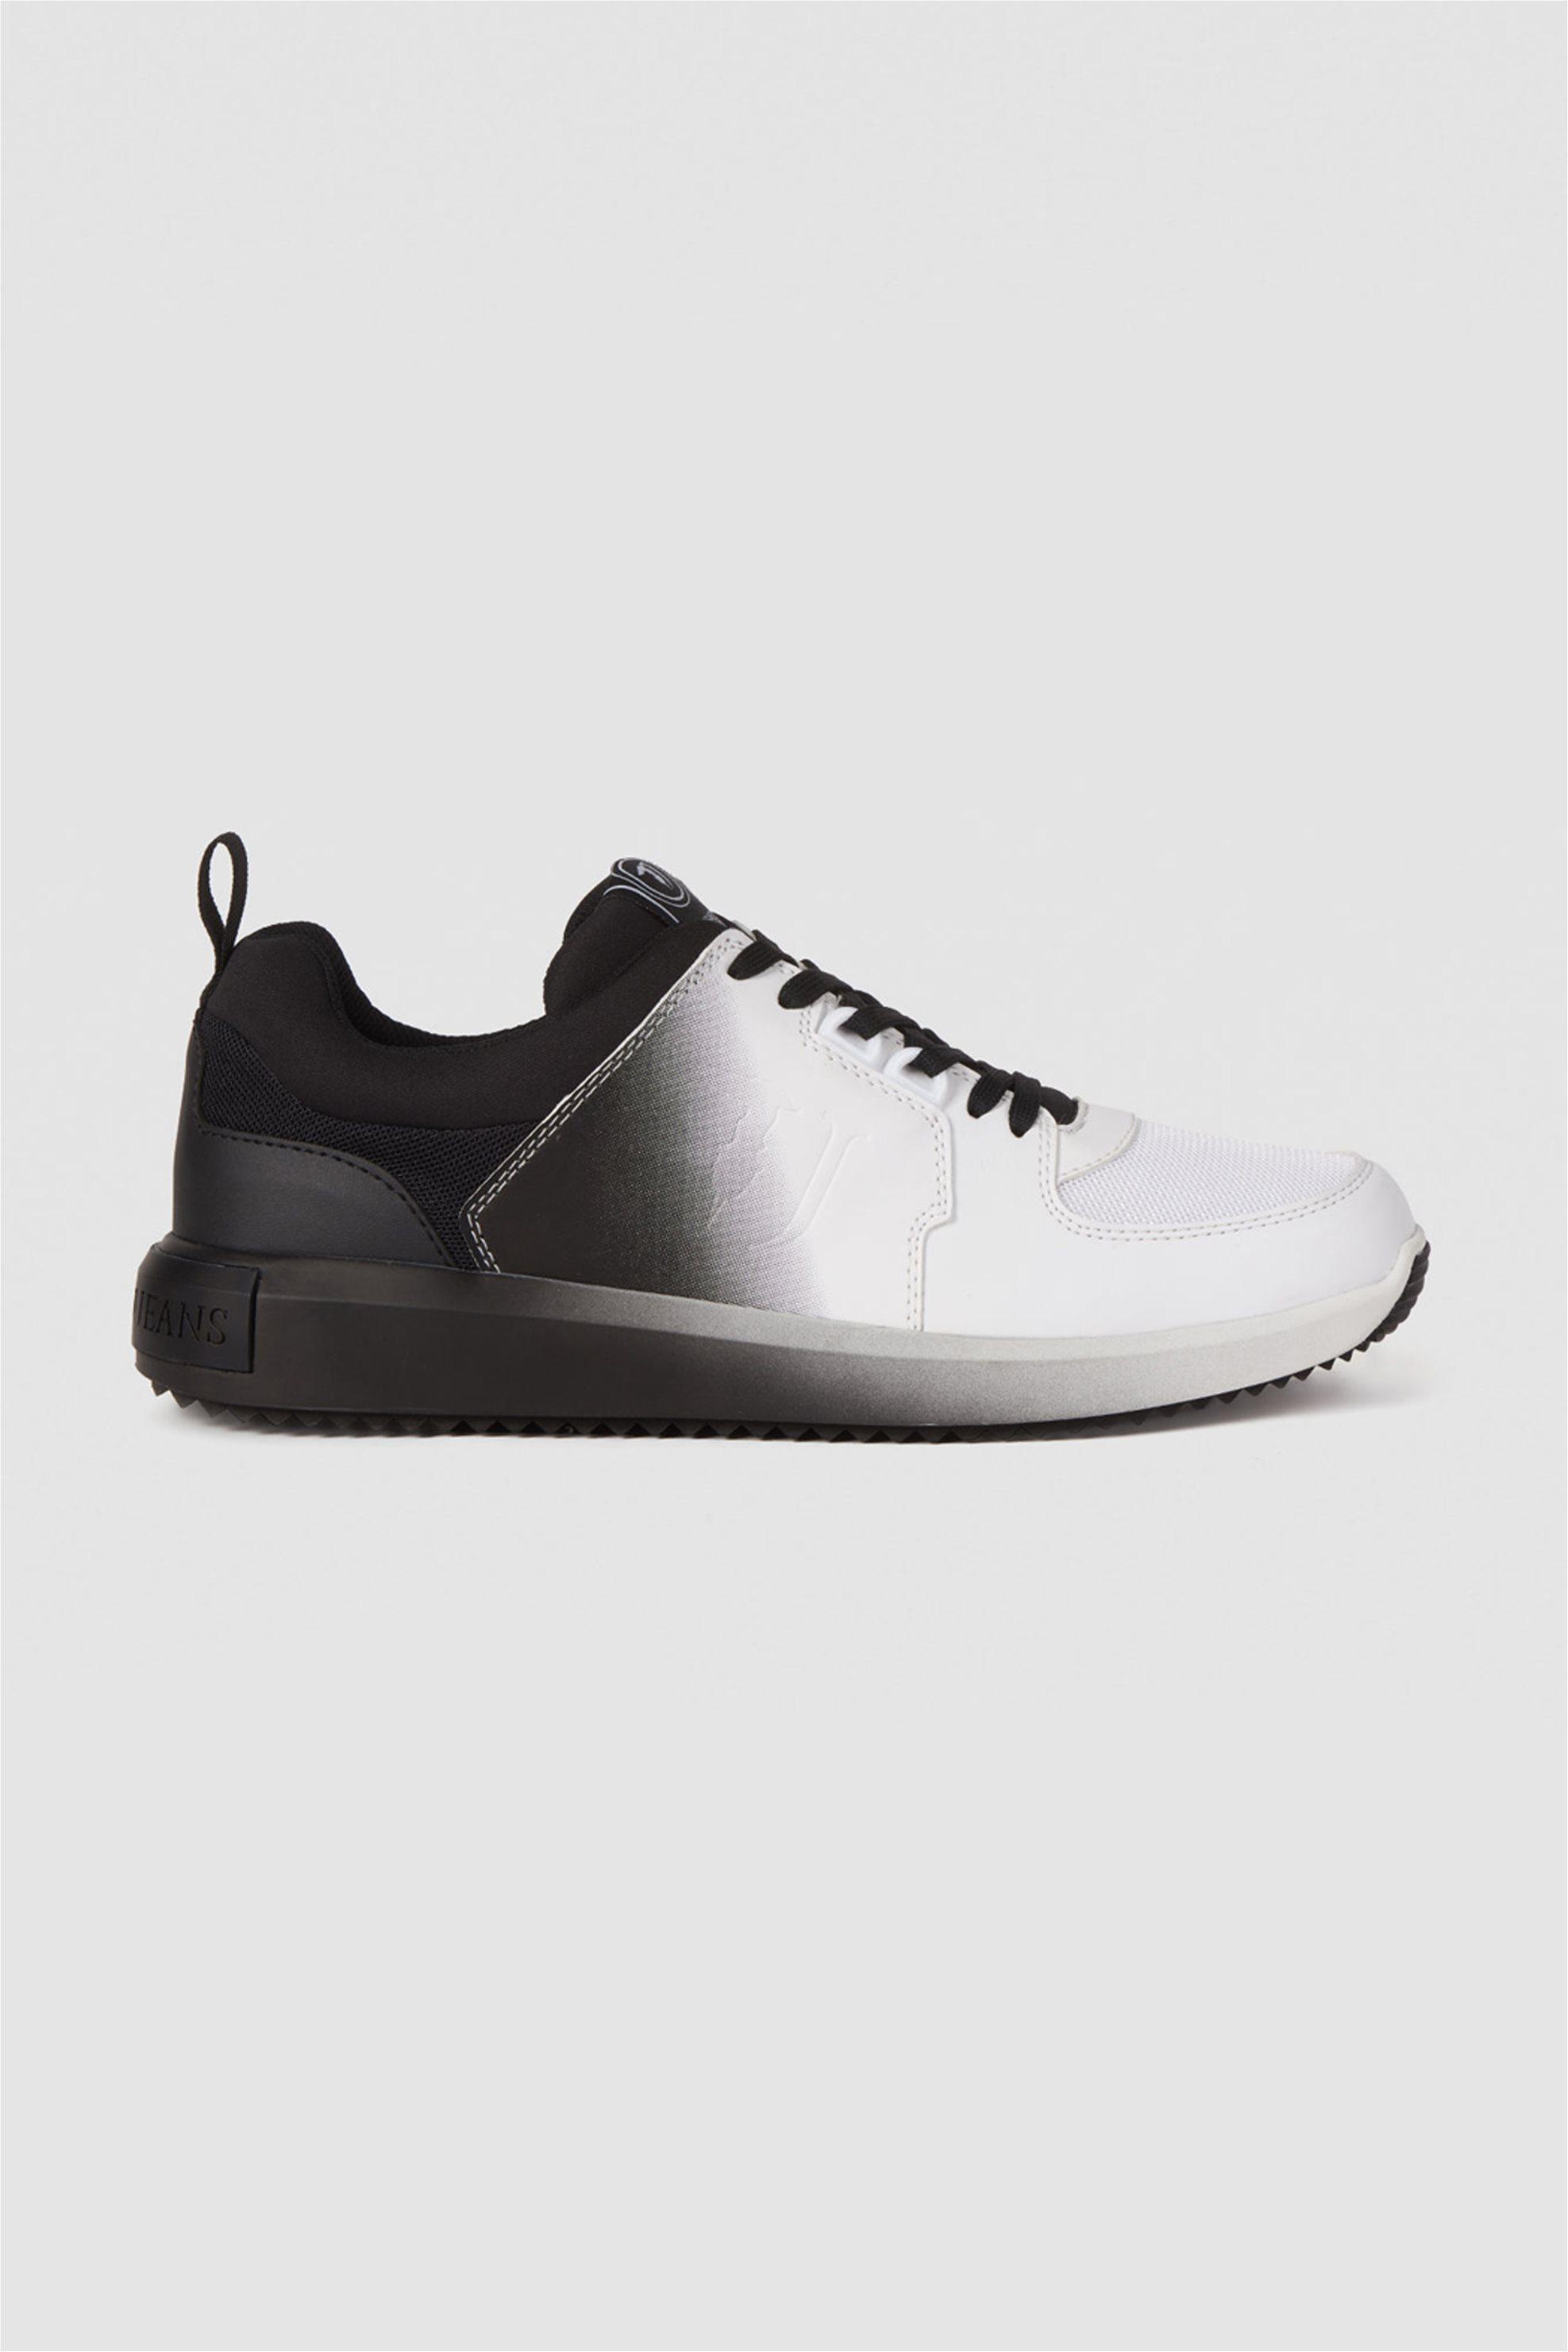 Trussardi ανδρικά sneakers με graduated effect – 77A00185-9Y099999 – Μαύρο